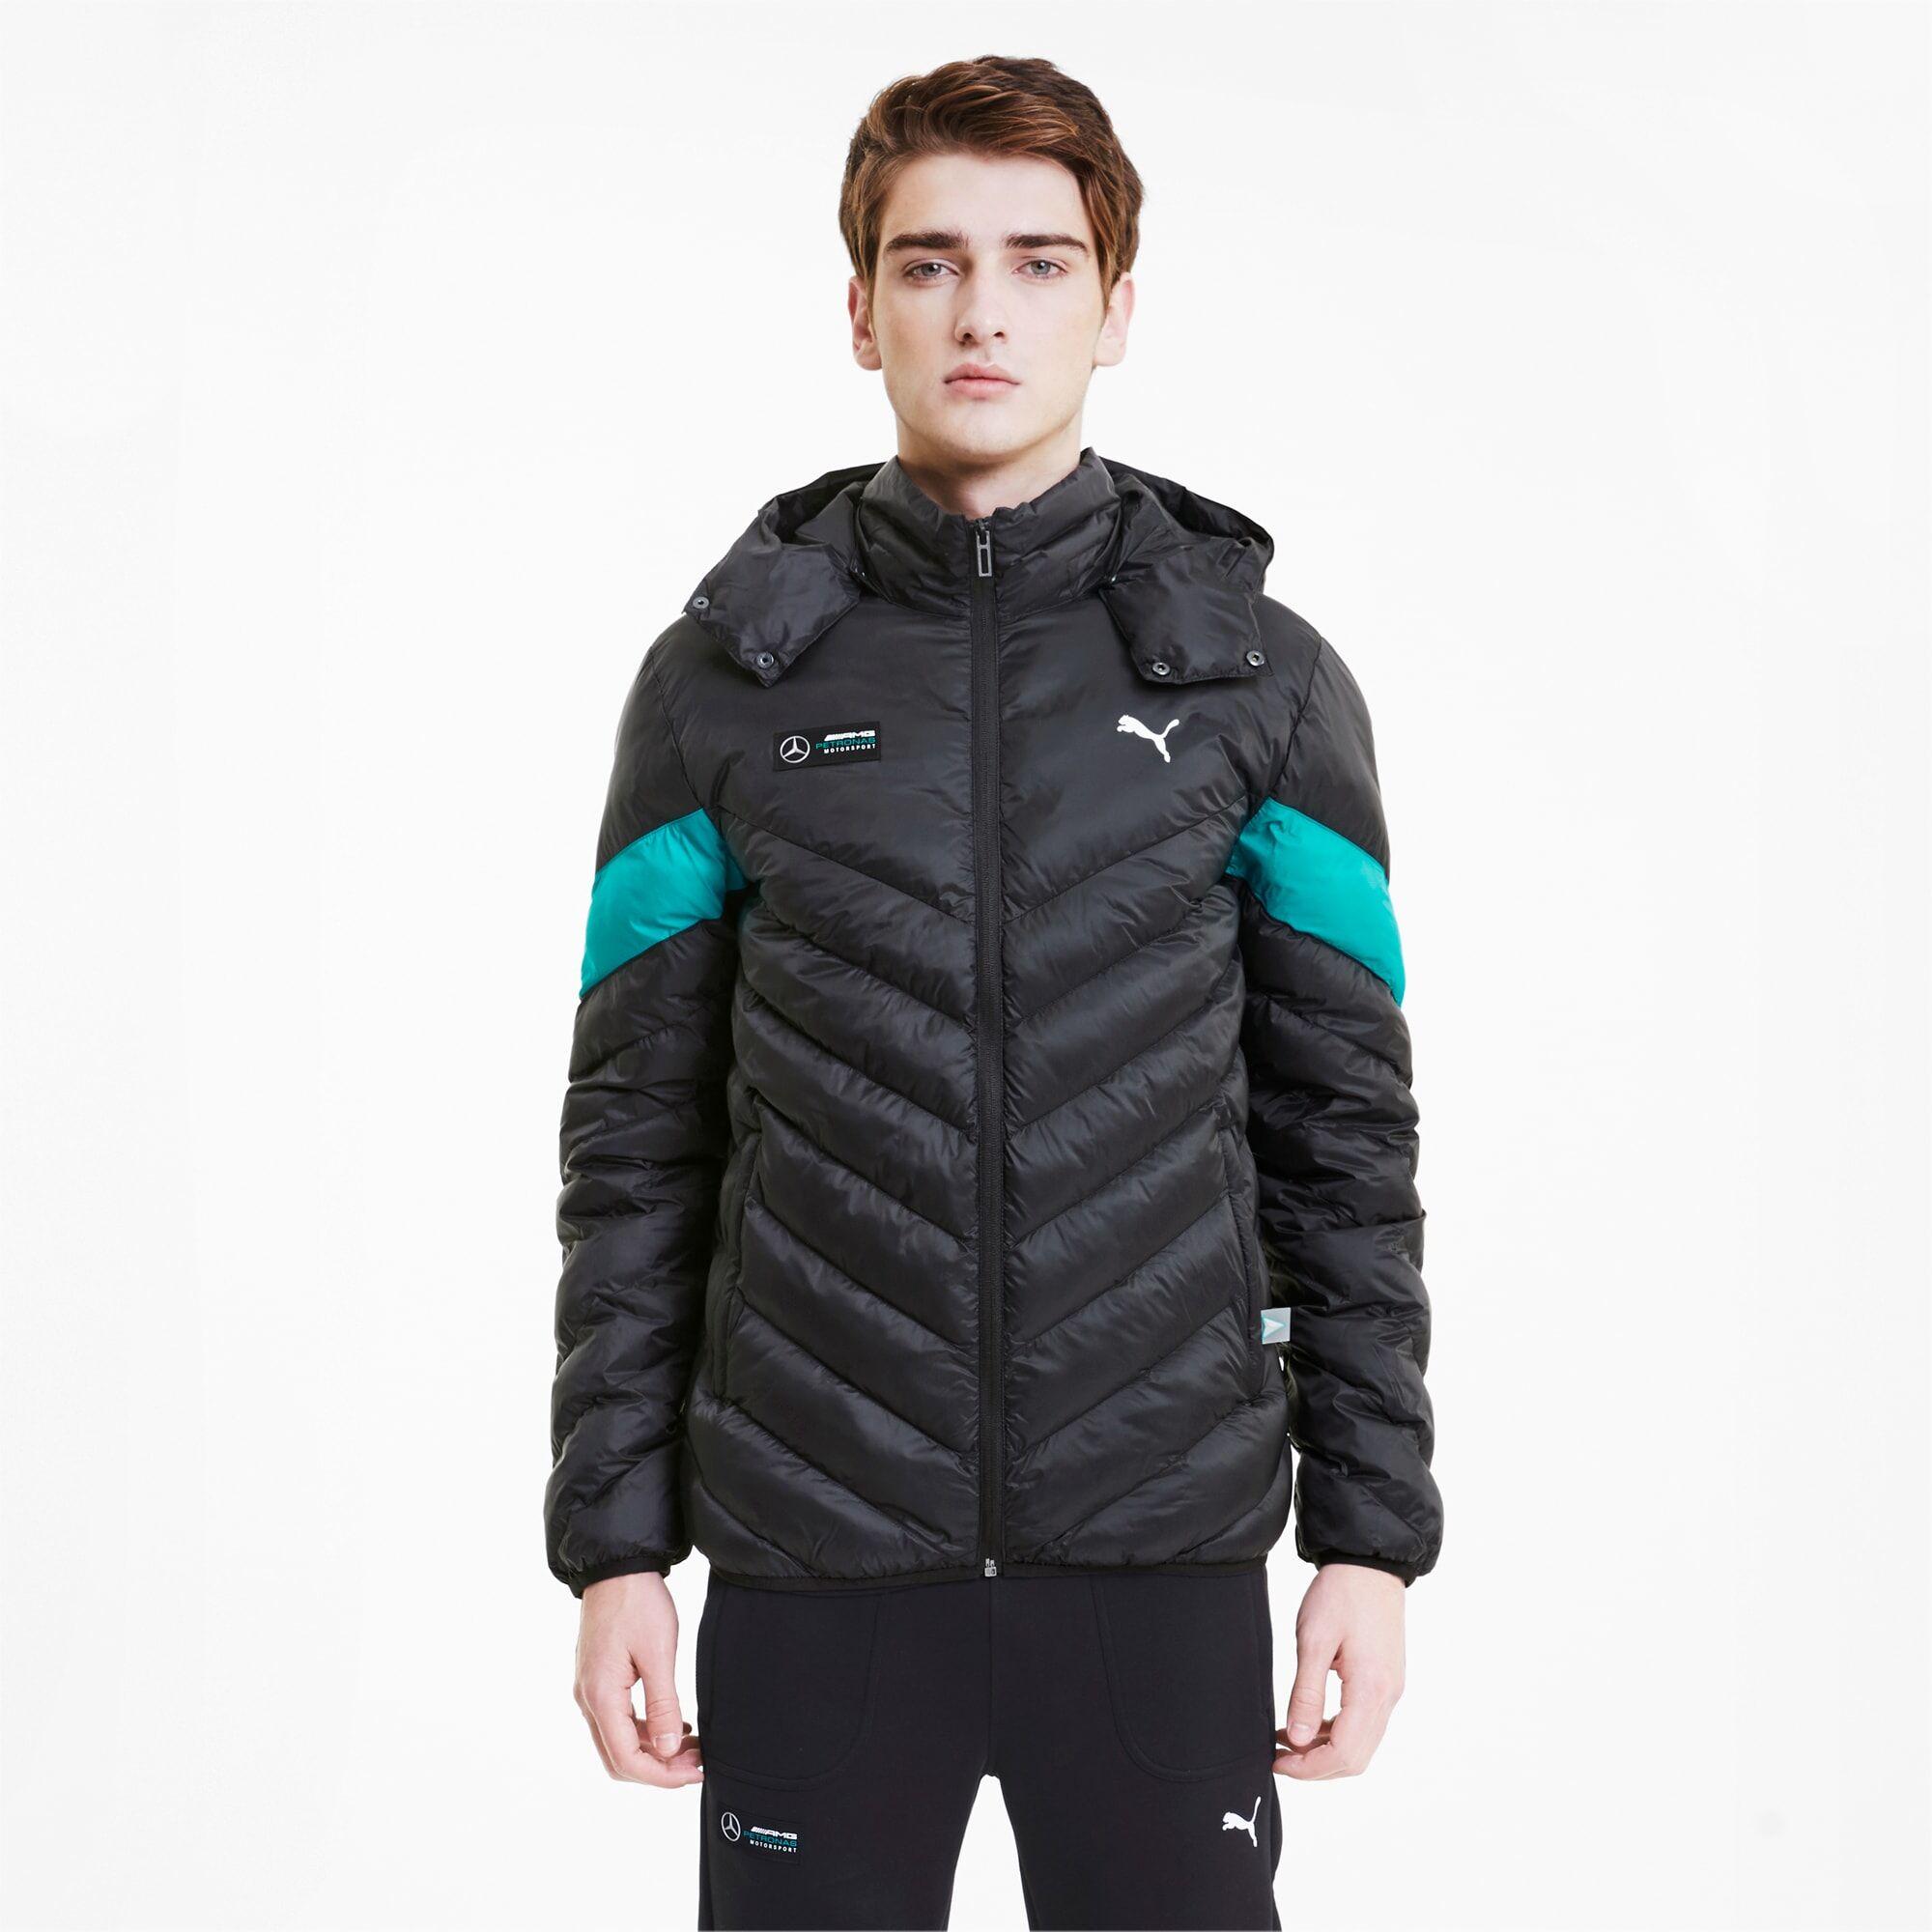 Puma Mercedes MCS Ecolite Men's Down Jacket, Black, size Medium, Clothing